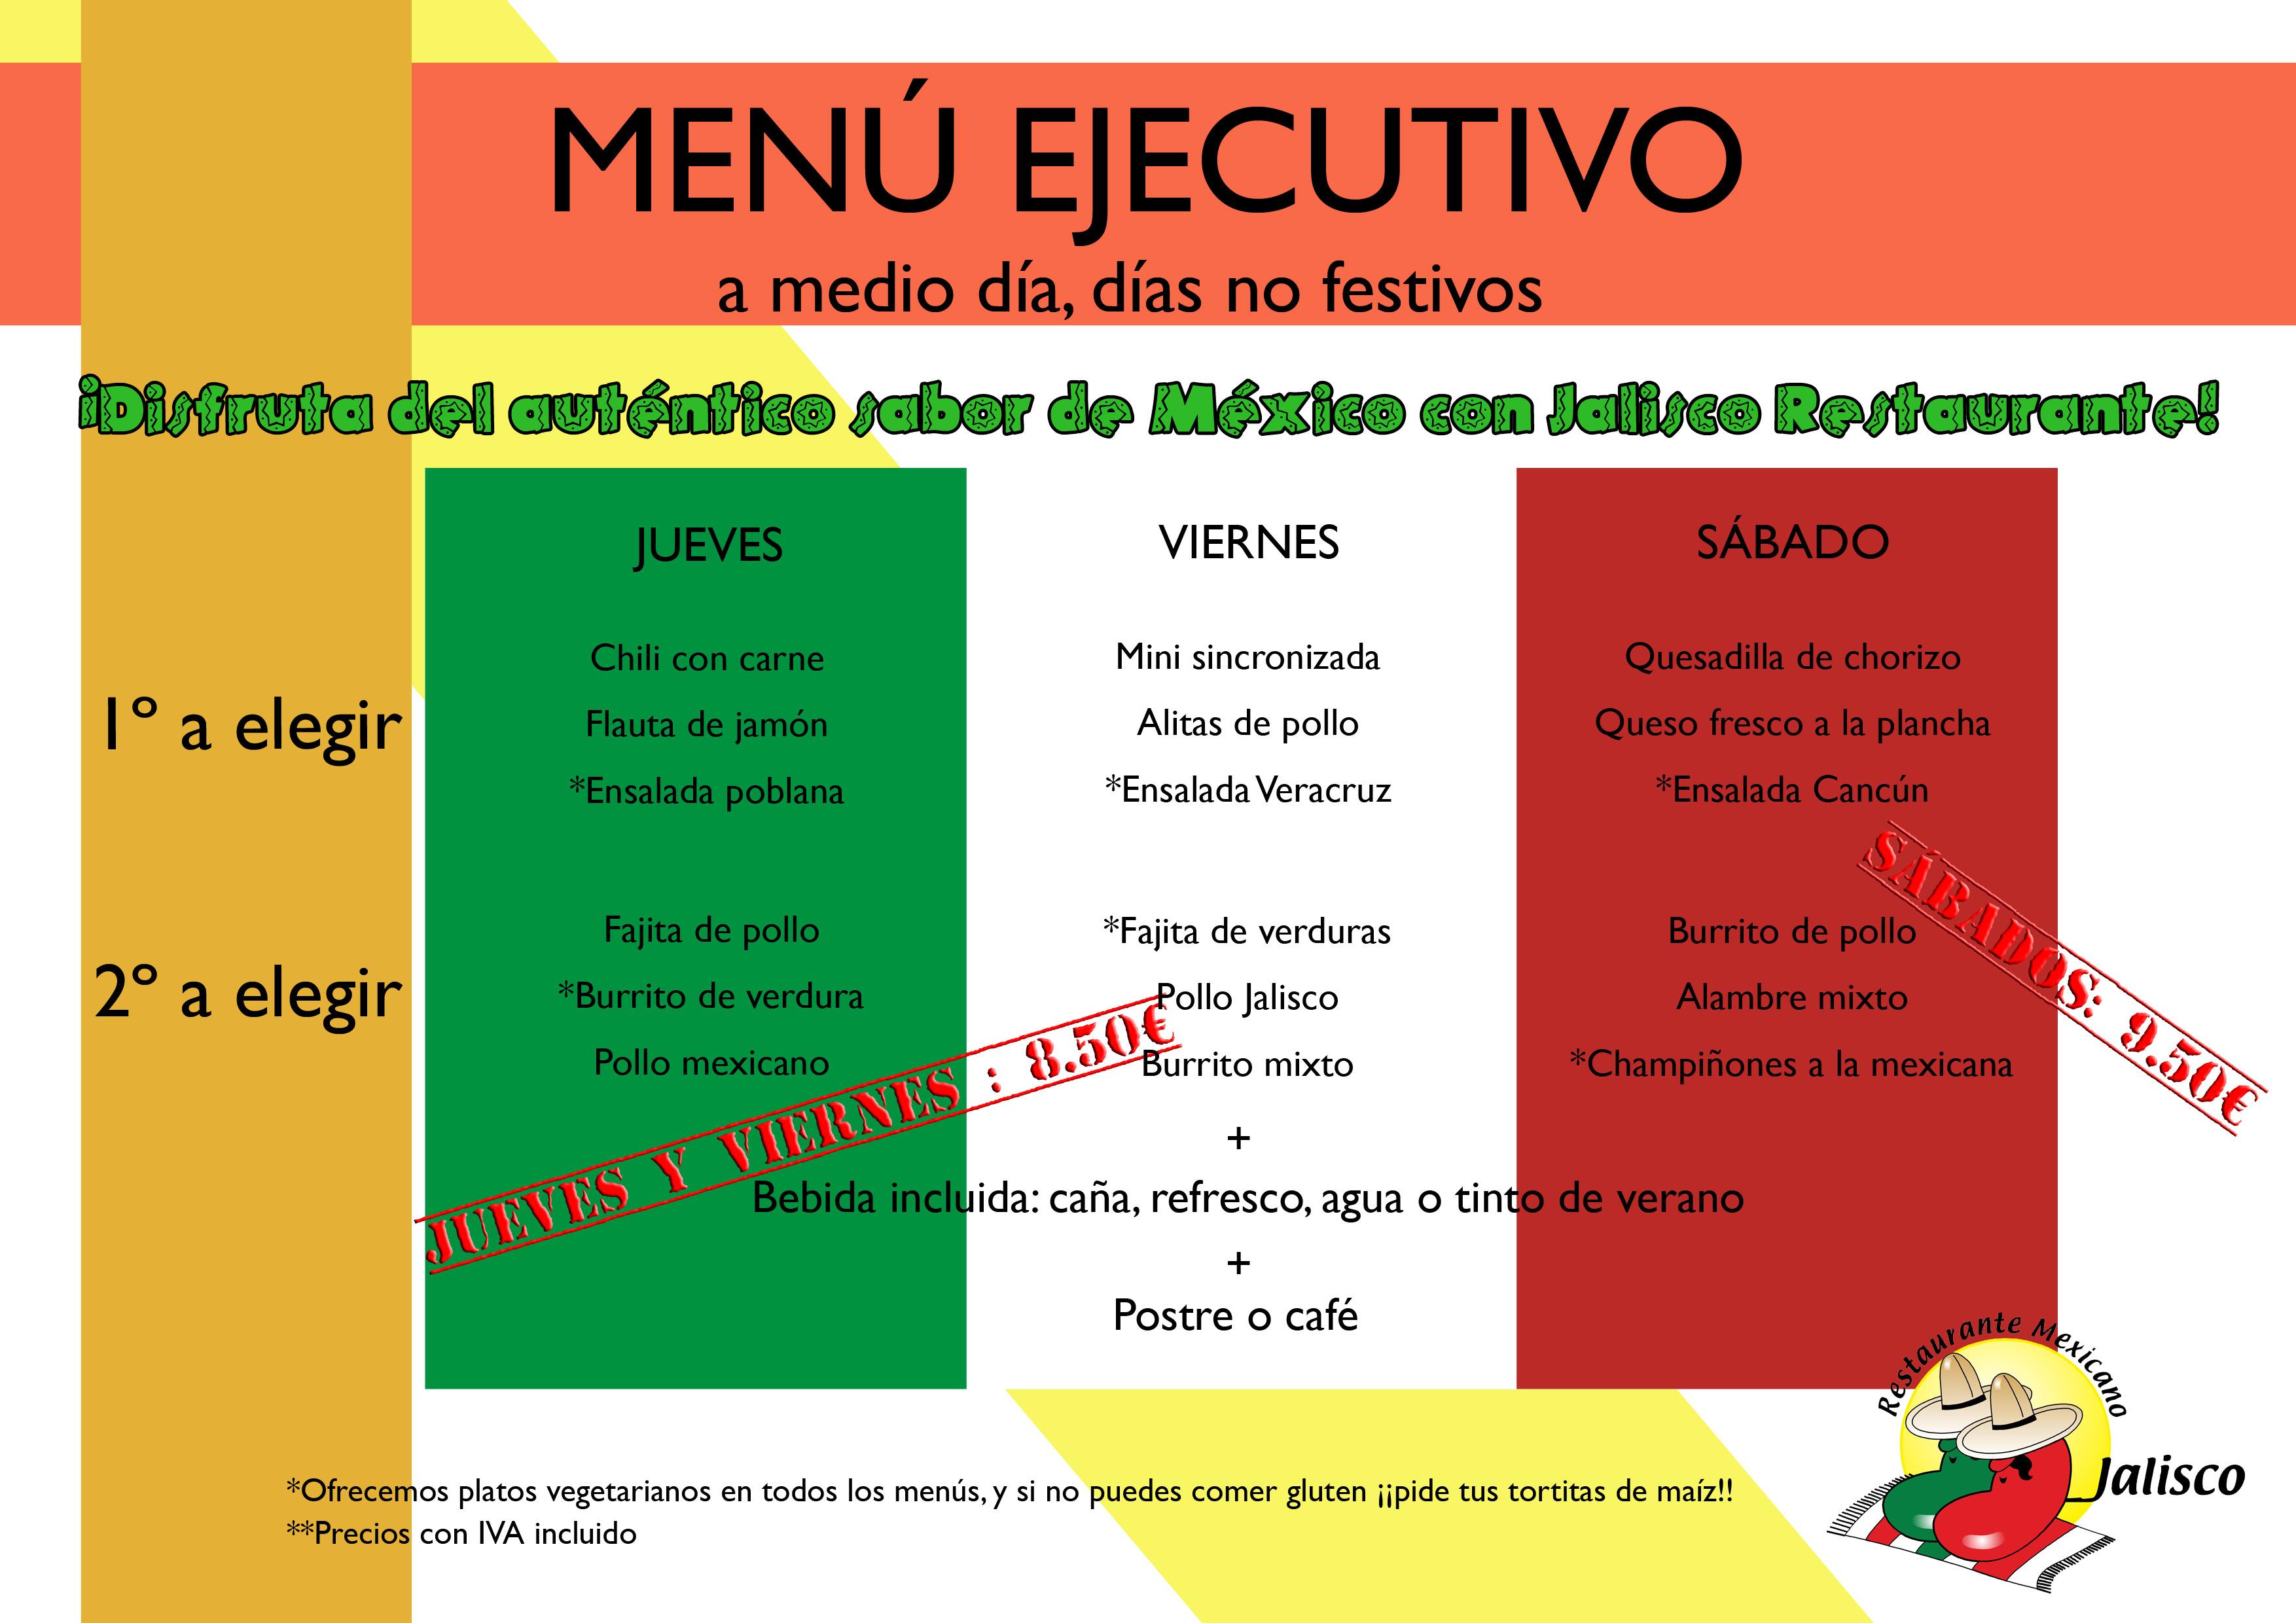 A la hora de comer, Menú Ejecuto! | El Blog del Jalisco